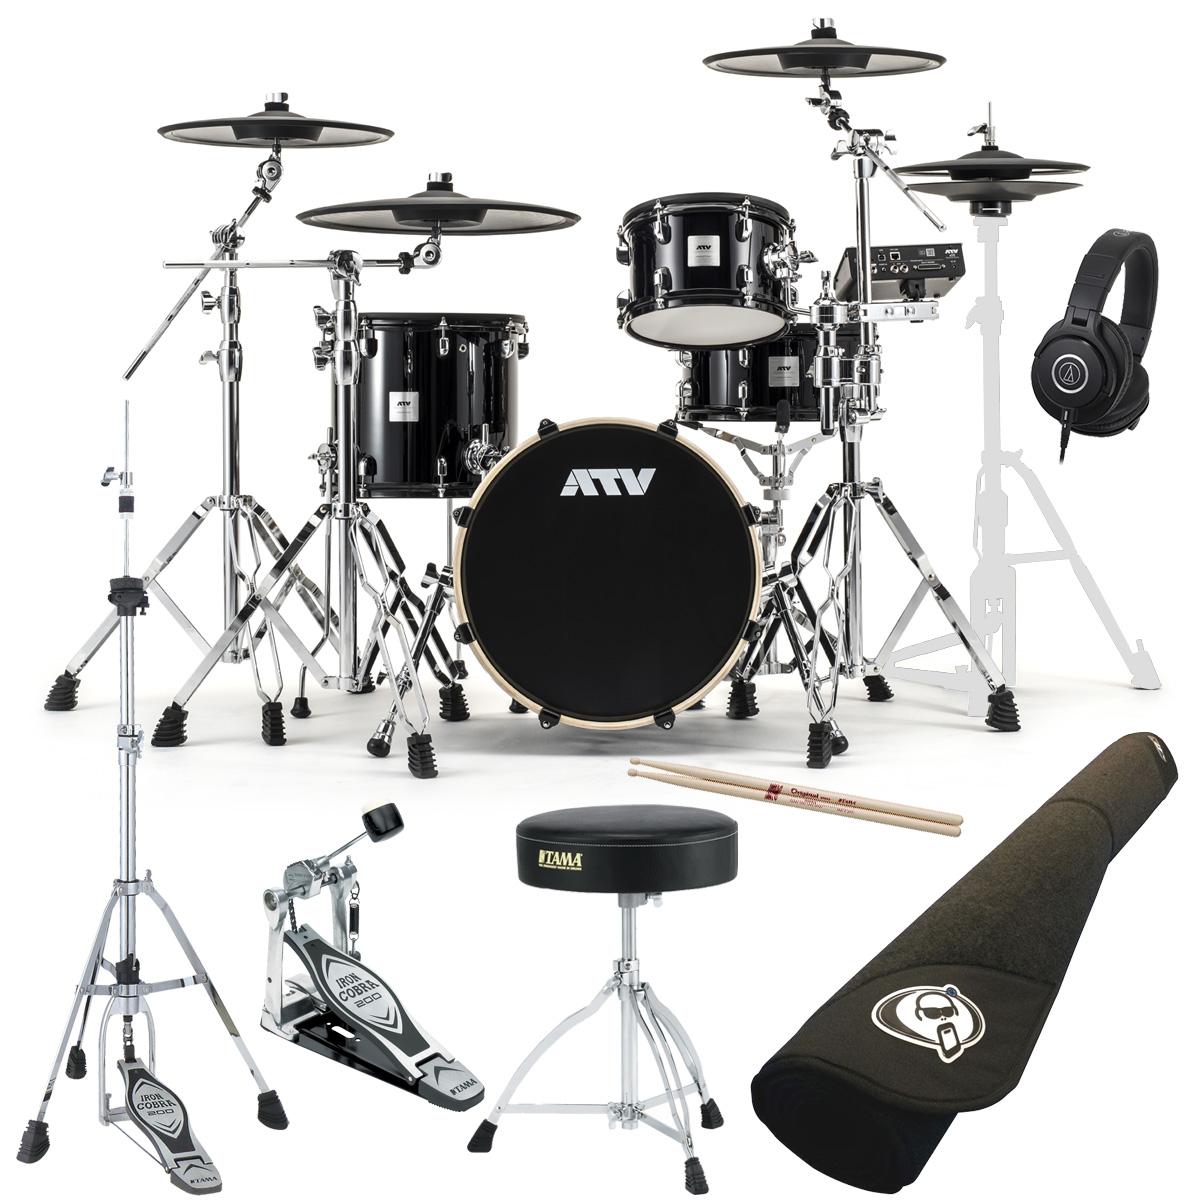 ATV / aDrums artist Standard Set ADA-STDSET 3シンバル TAMAスターターパック プロラケ・マット付き《予約注文/納期12月上旬頃予定》